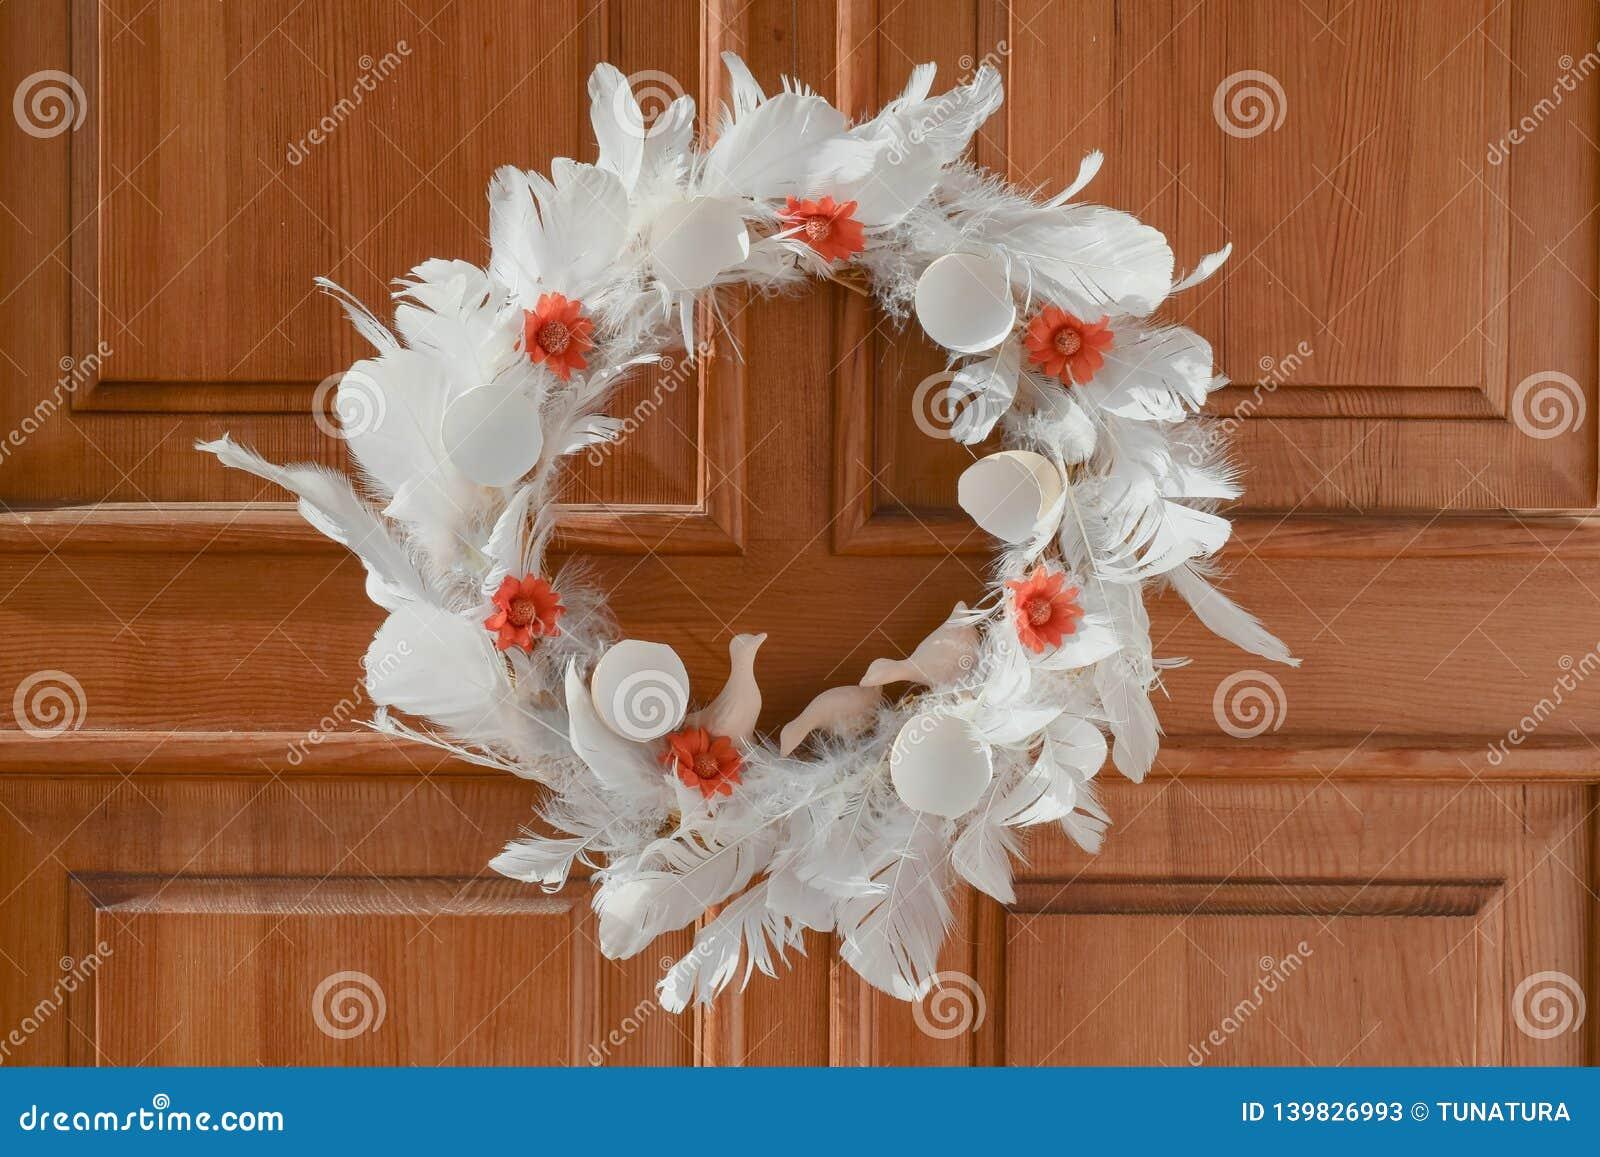 Natural Easter wreath on the door